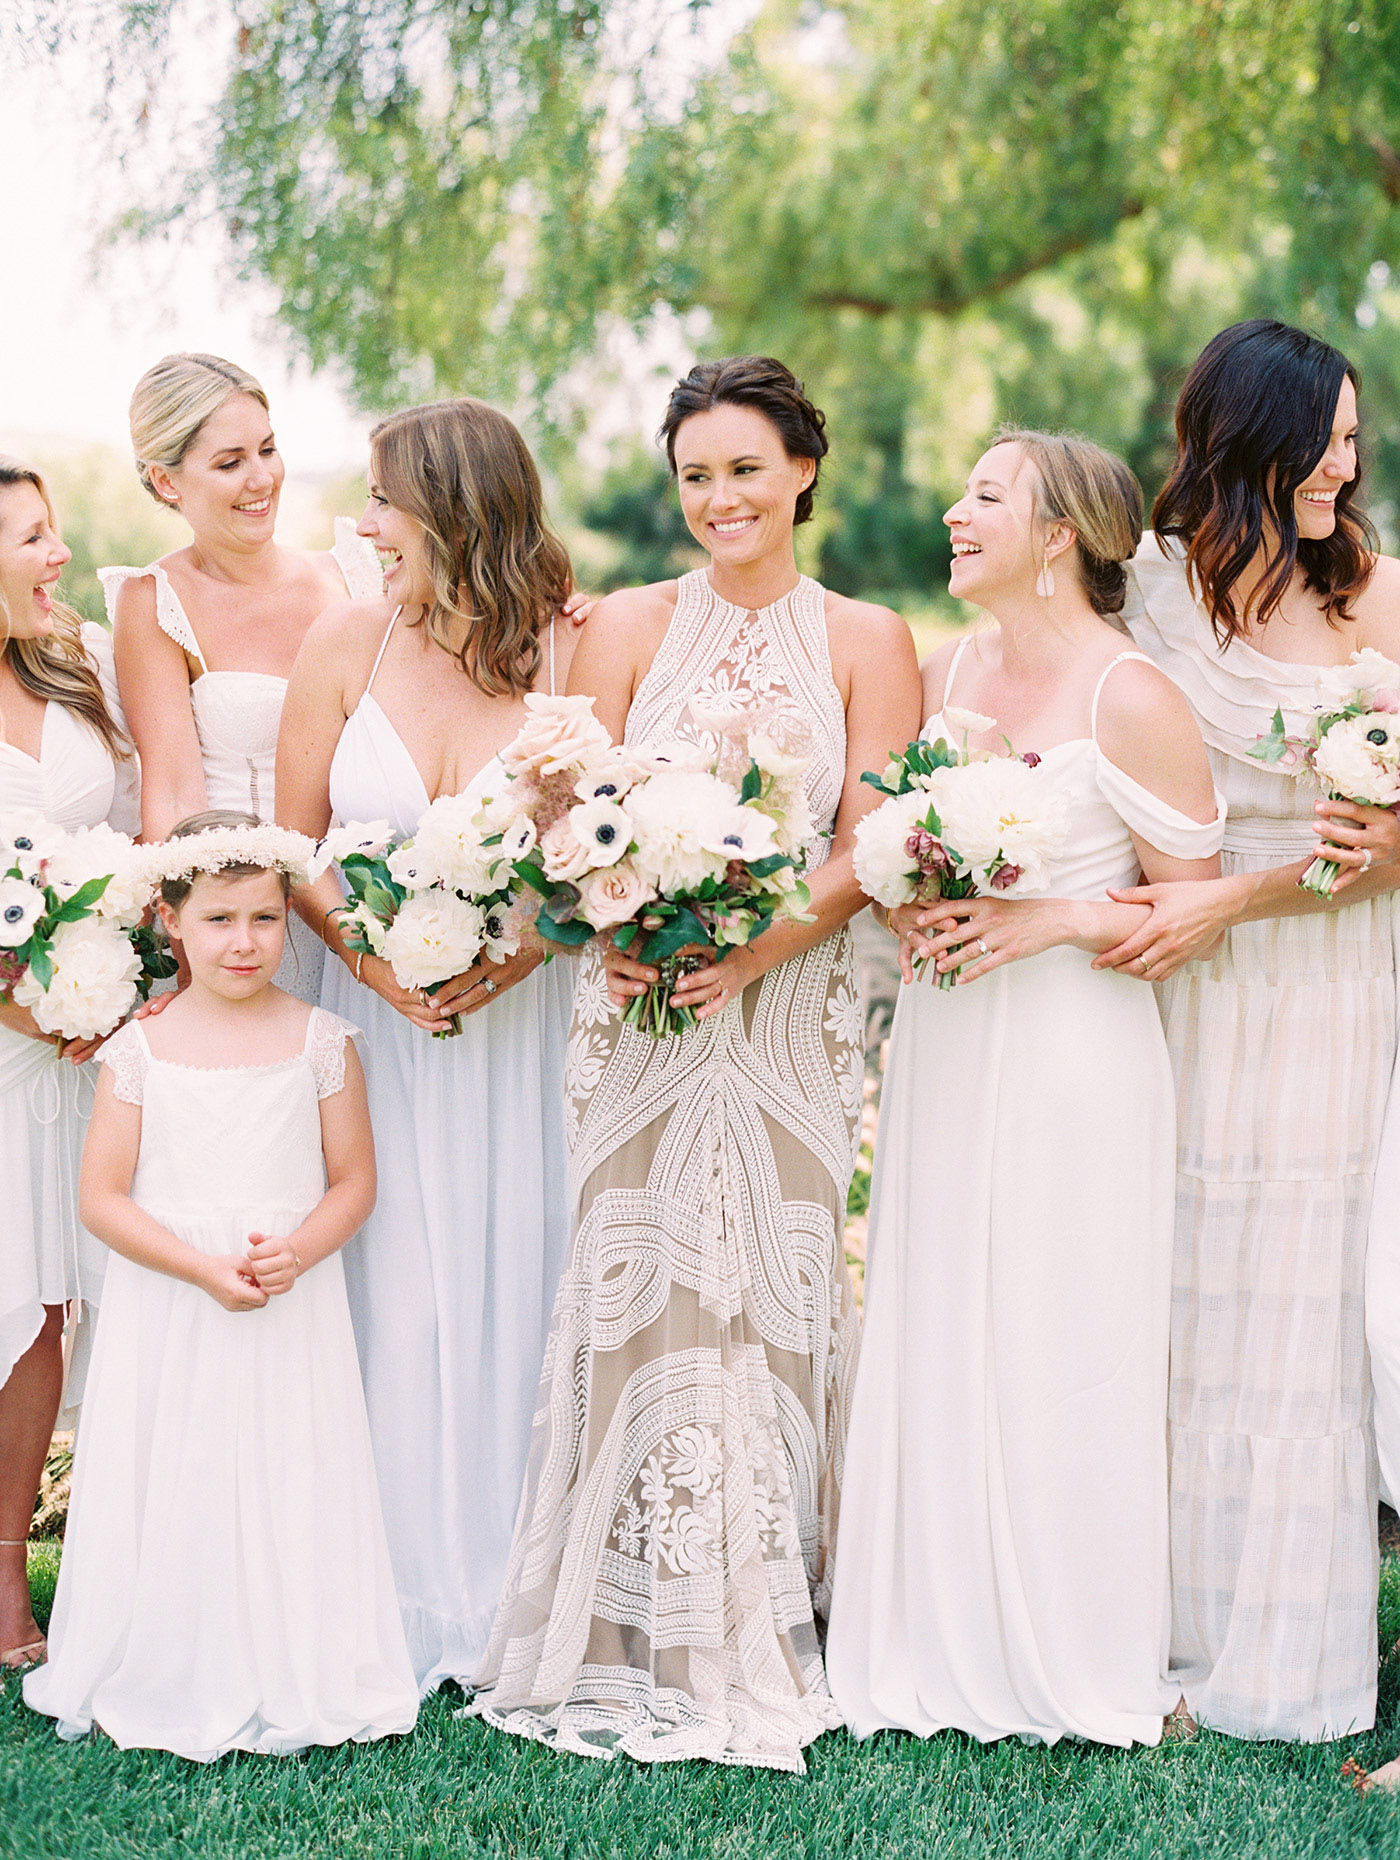 Caitlin and Fletcher wedding bridesmaids and bride